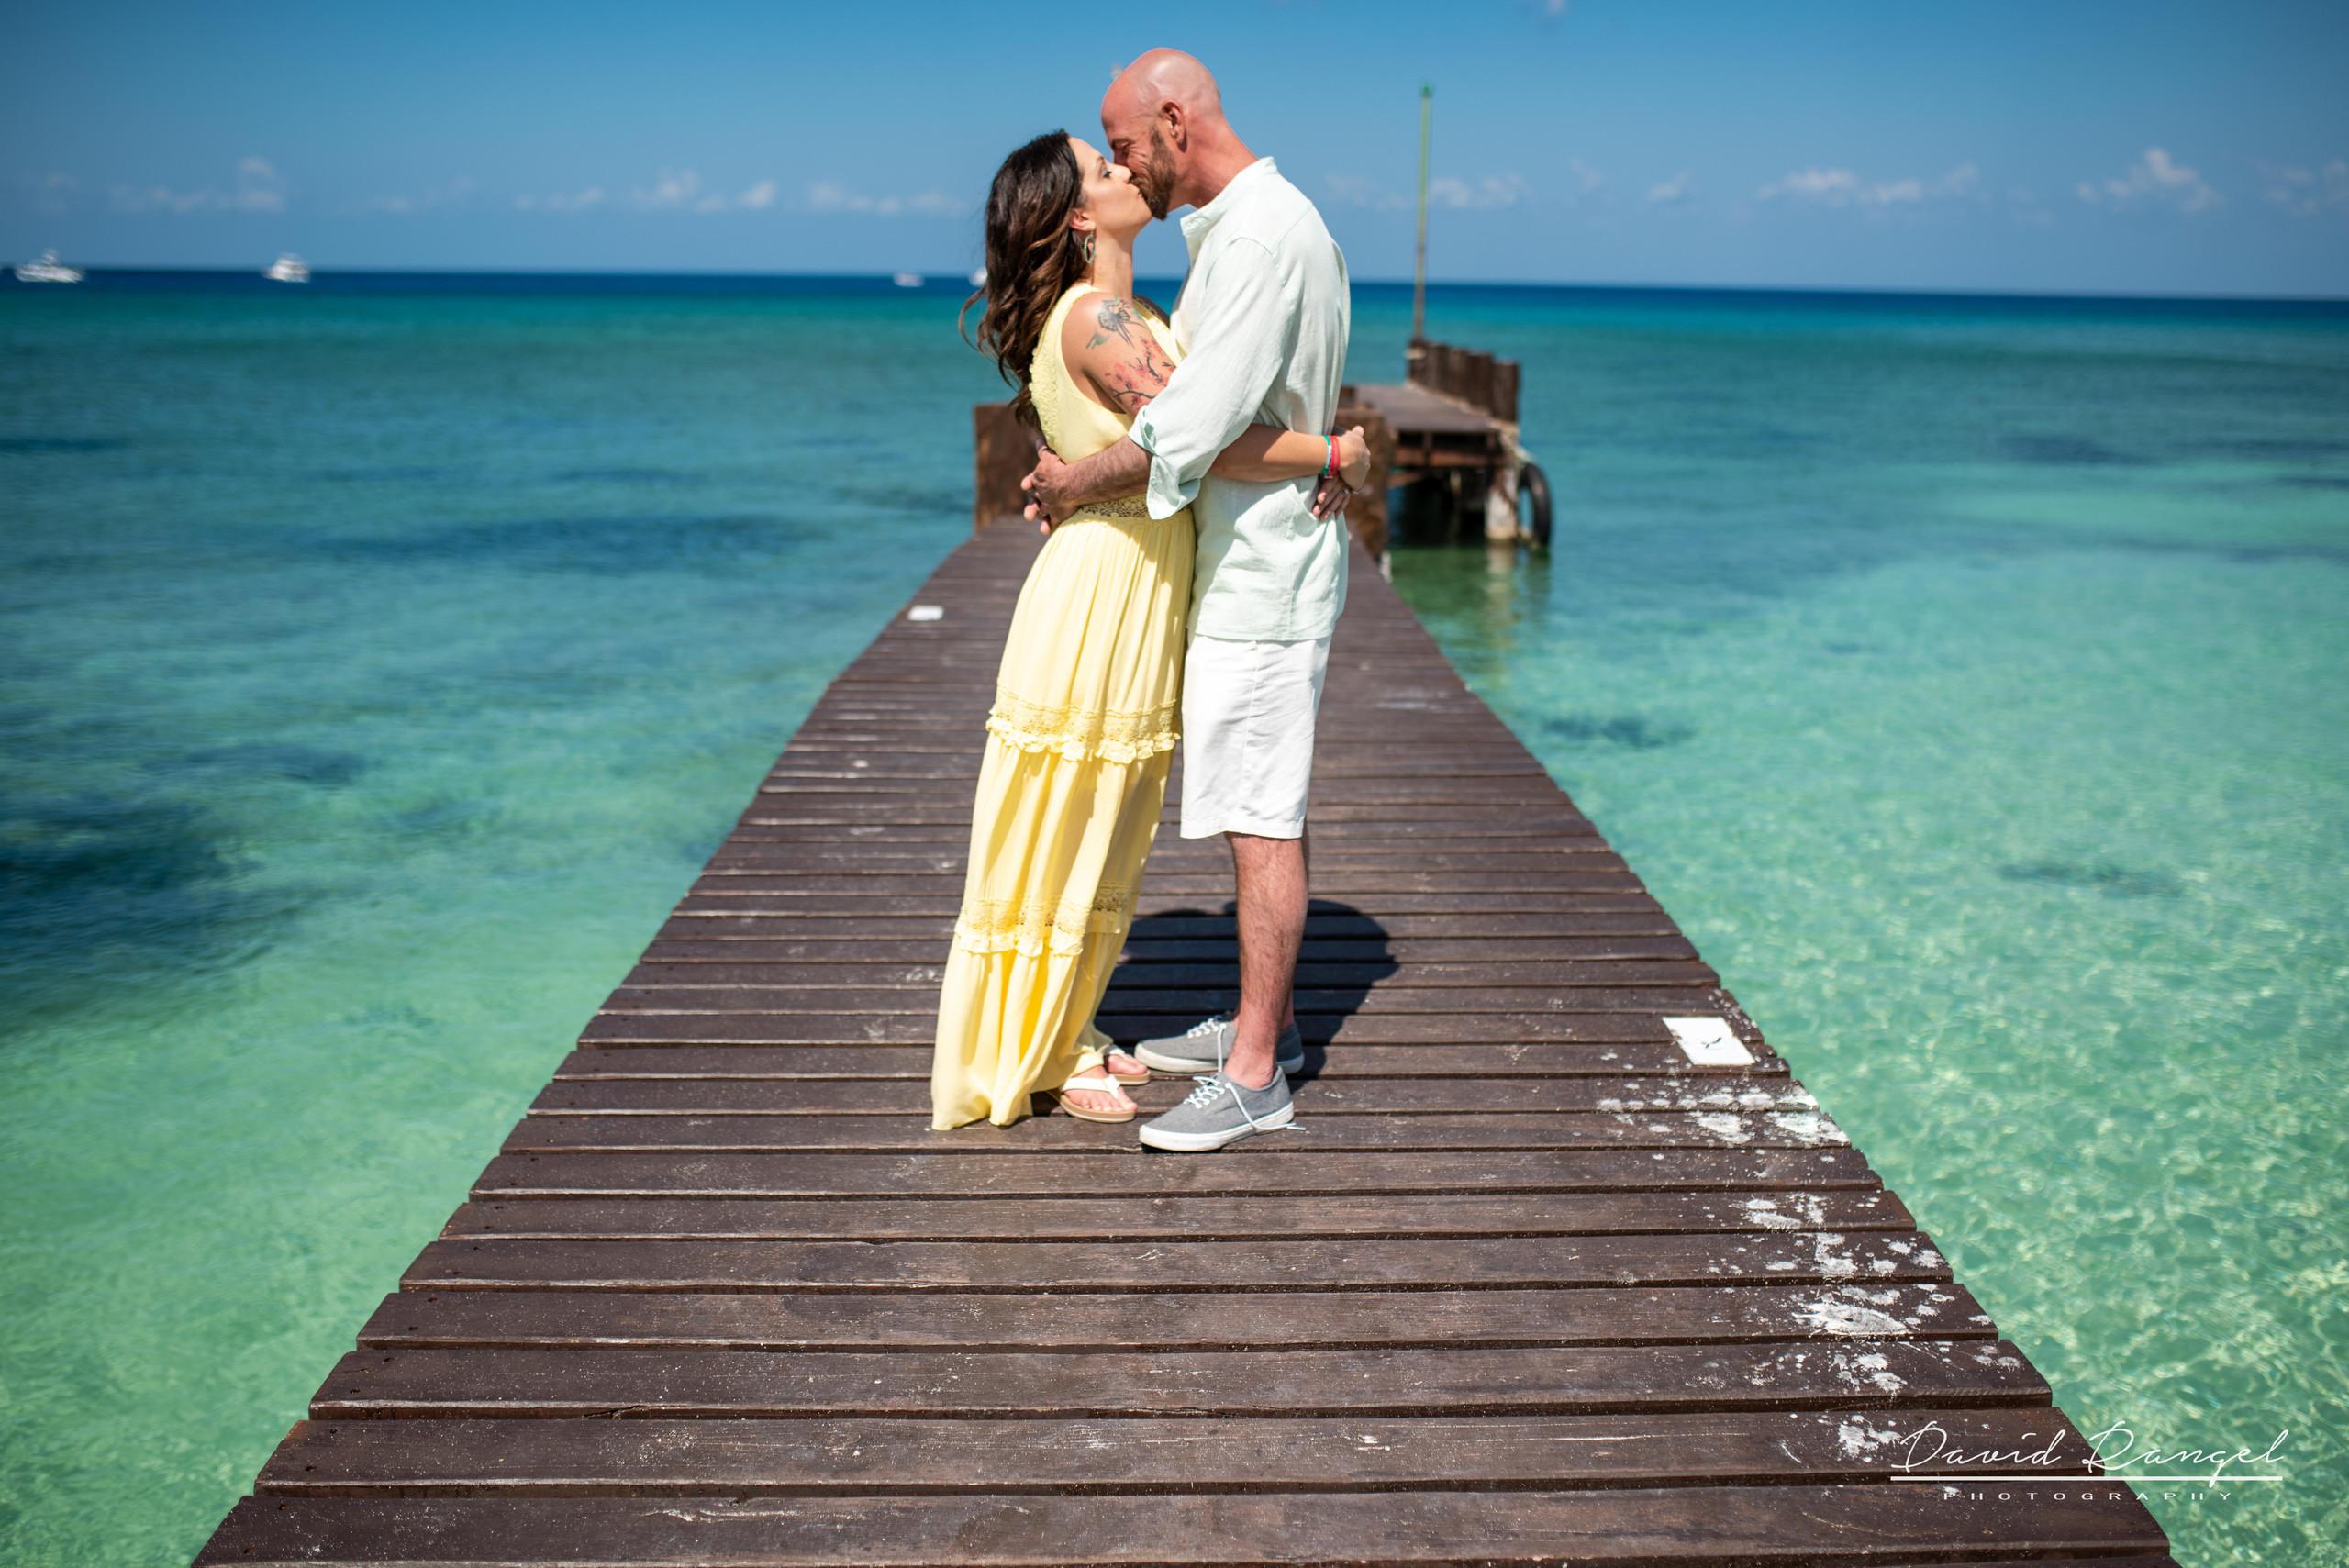 family+session+beach+cozumel+island+photo+destination+photographer+kids+couple+water+pier